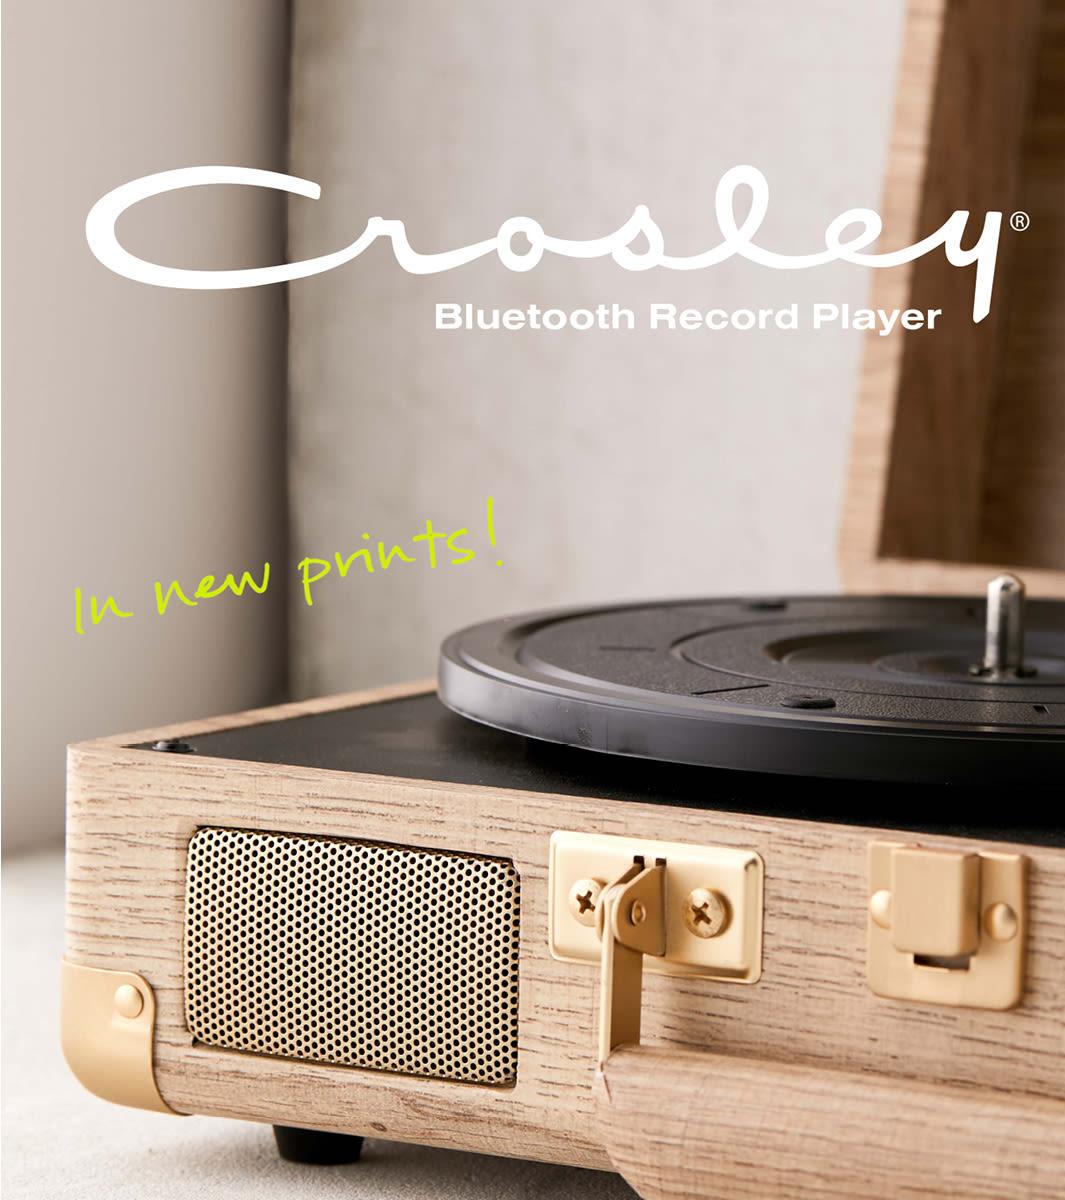 269fc442eb6 Crosley Cruiser Bluetooth Record Player